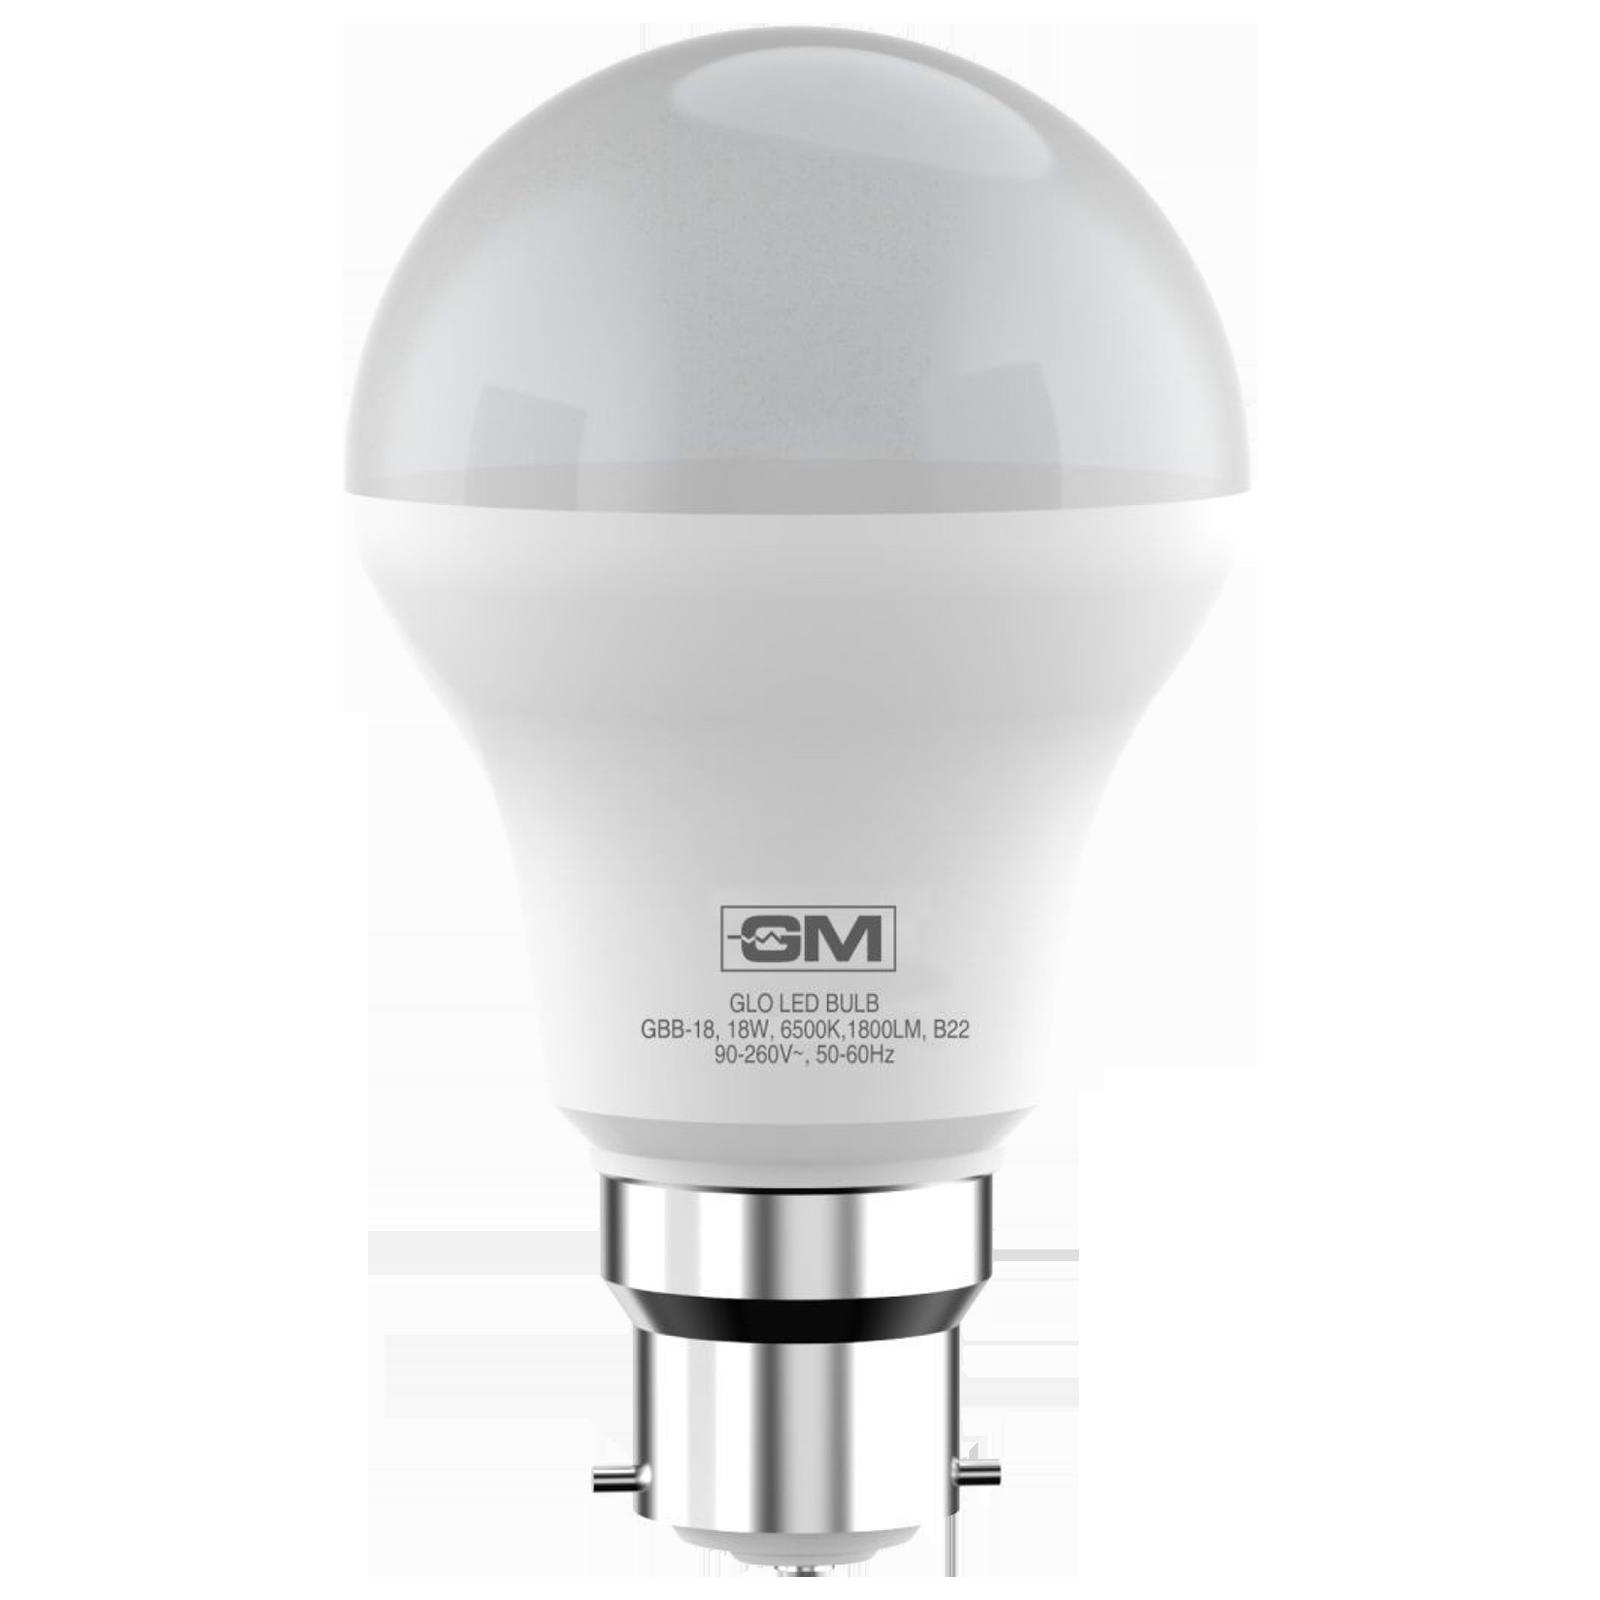 GM GLO 18 Watts Electric Powered LED Bulb (1800 Lumens, GBB-18-6.5K-6500K, White)_1